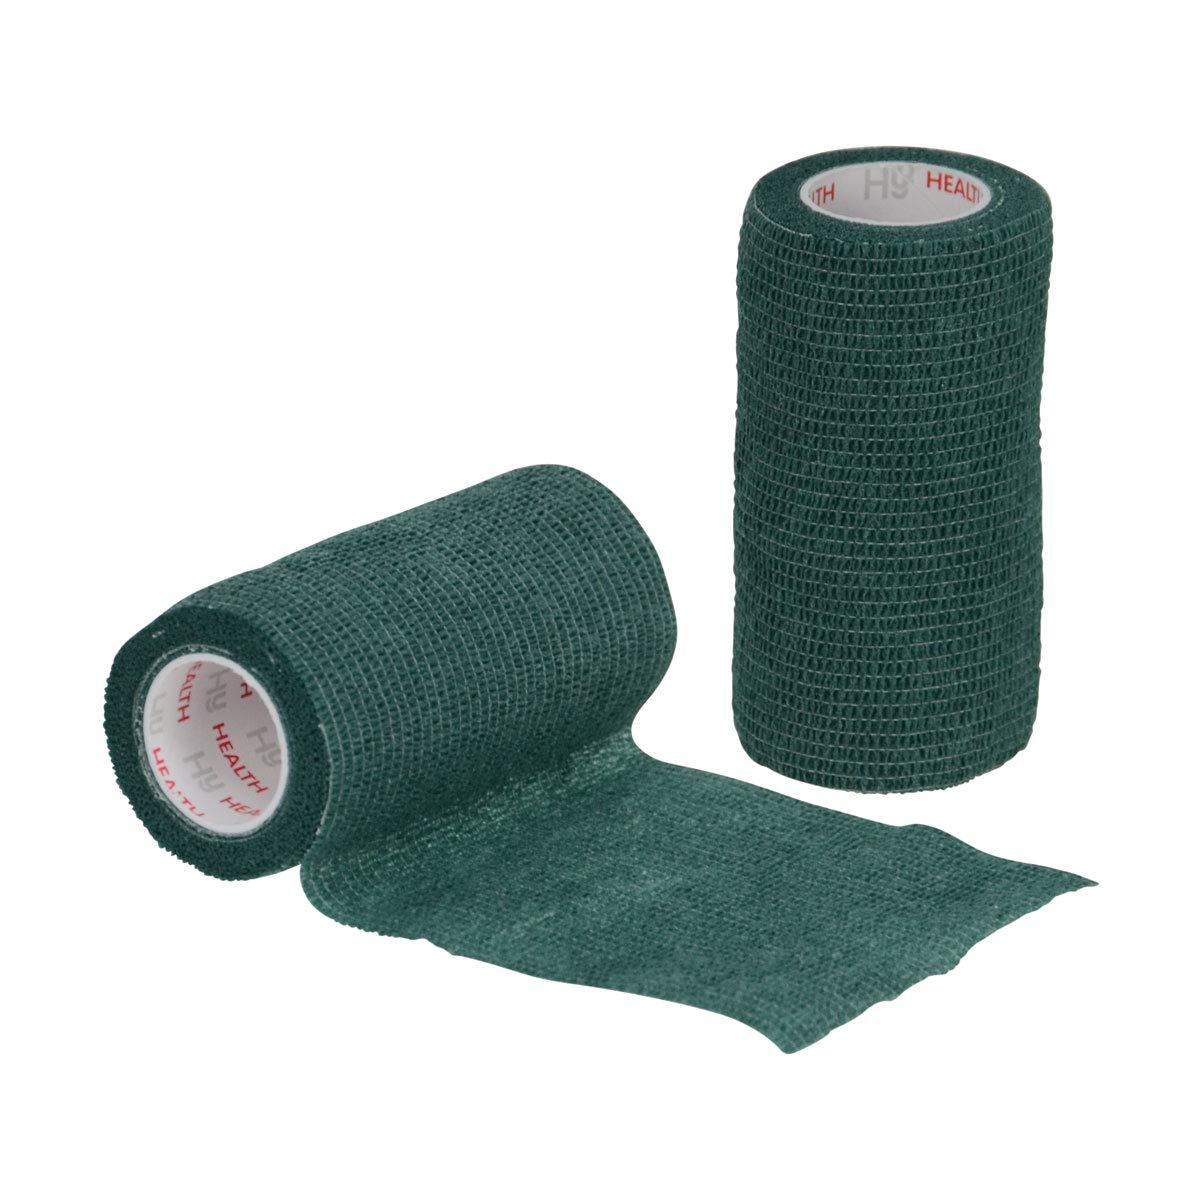 Plus Equine Cohesive Vetwrap Style Bandage - Special Offer!-Black The Saddlery Shop